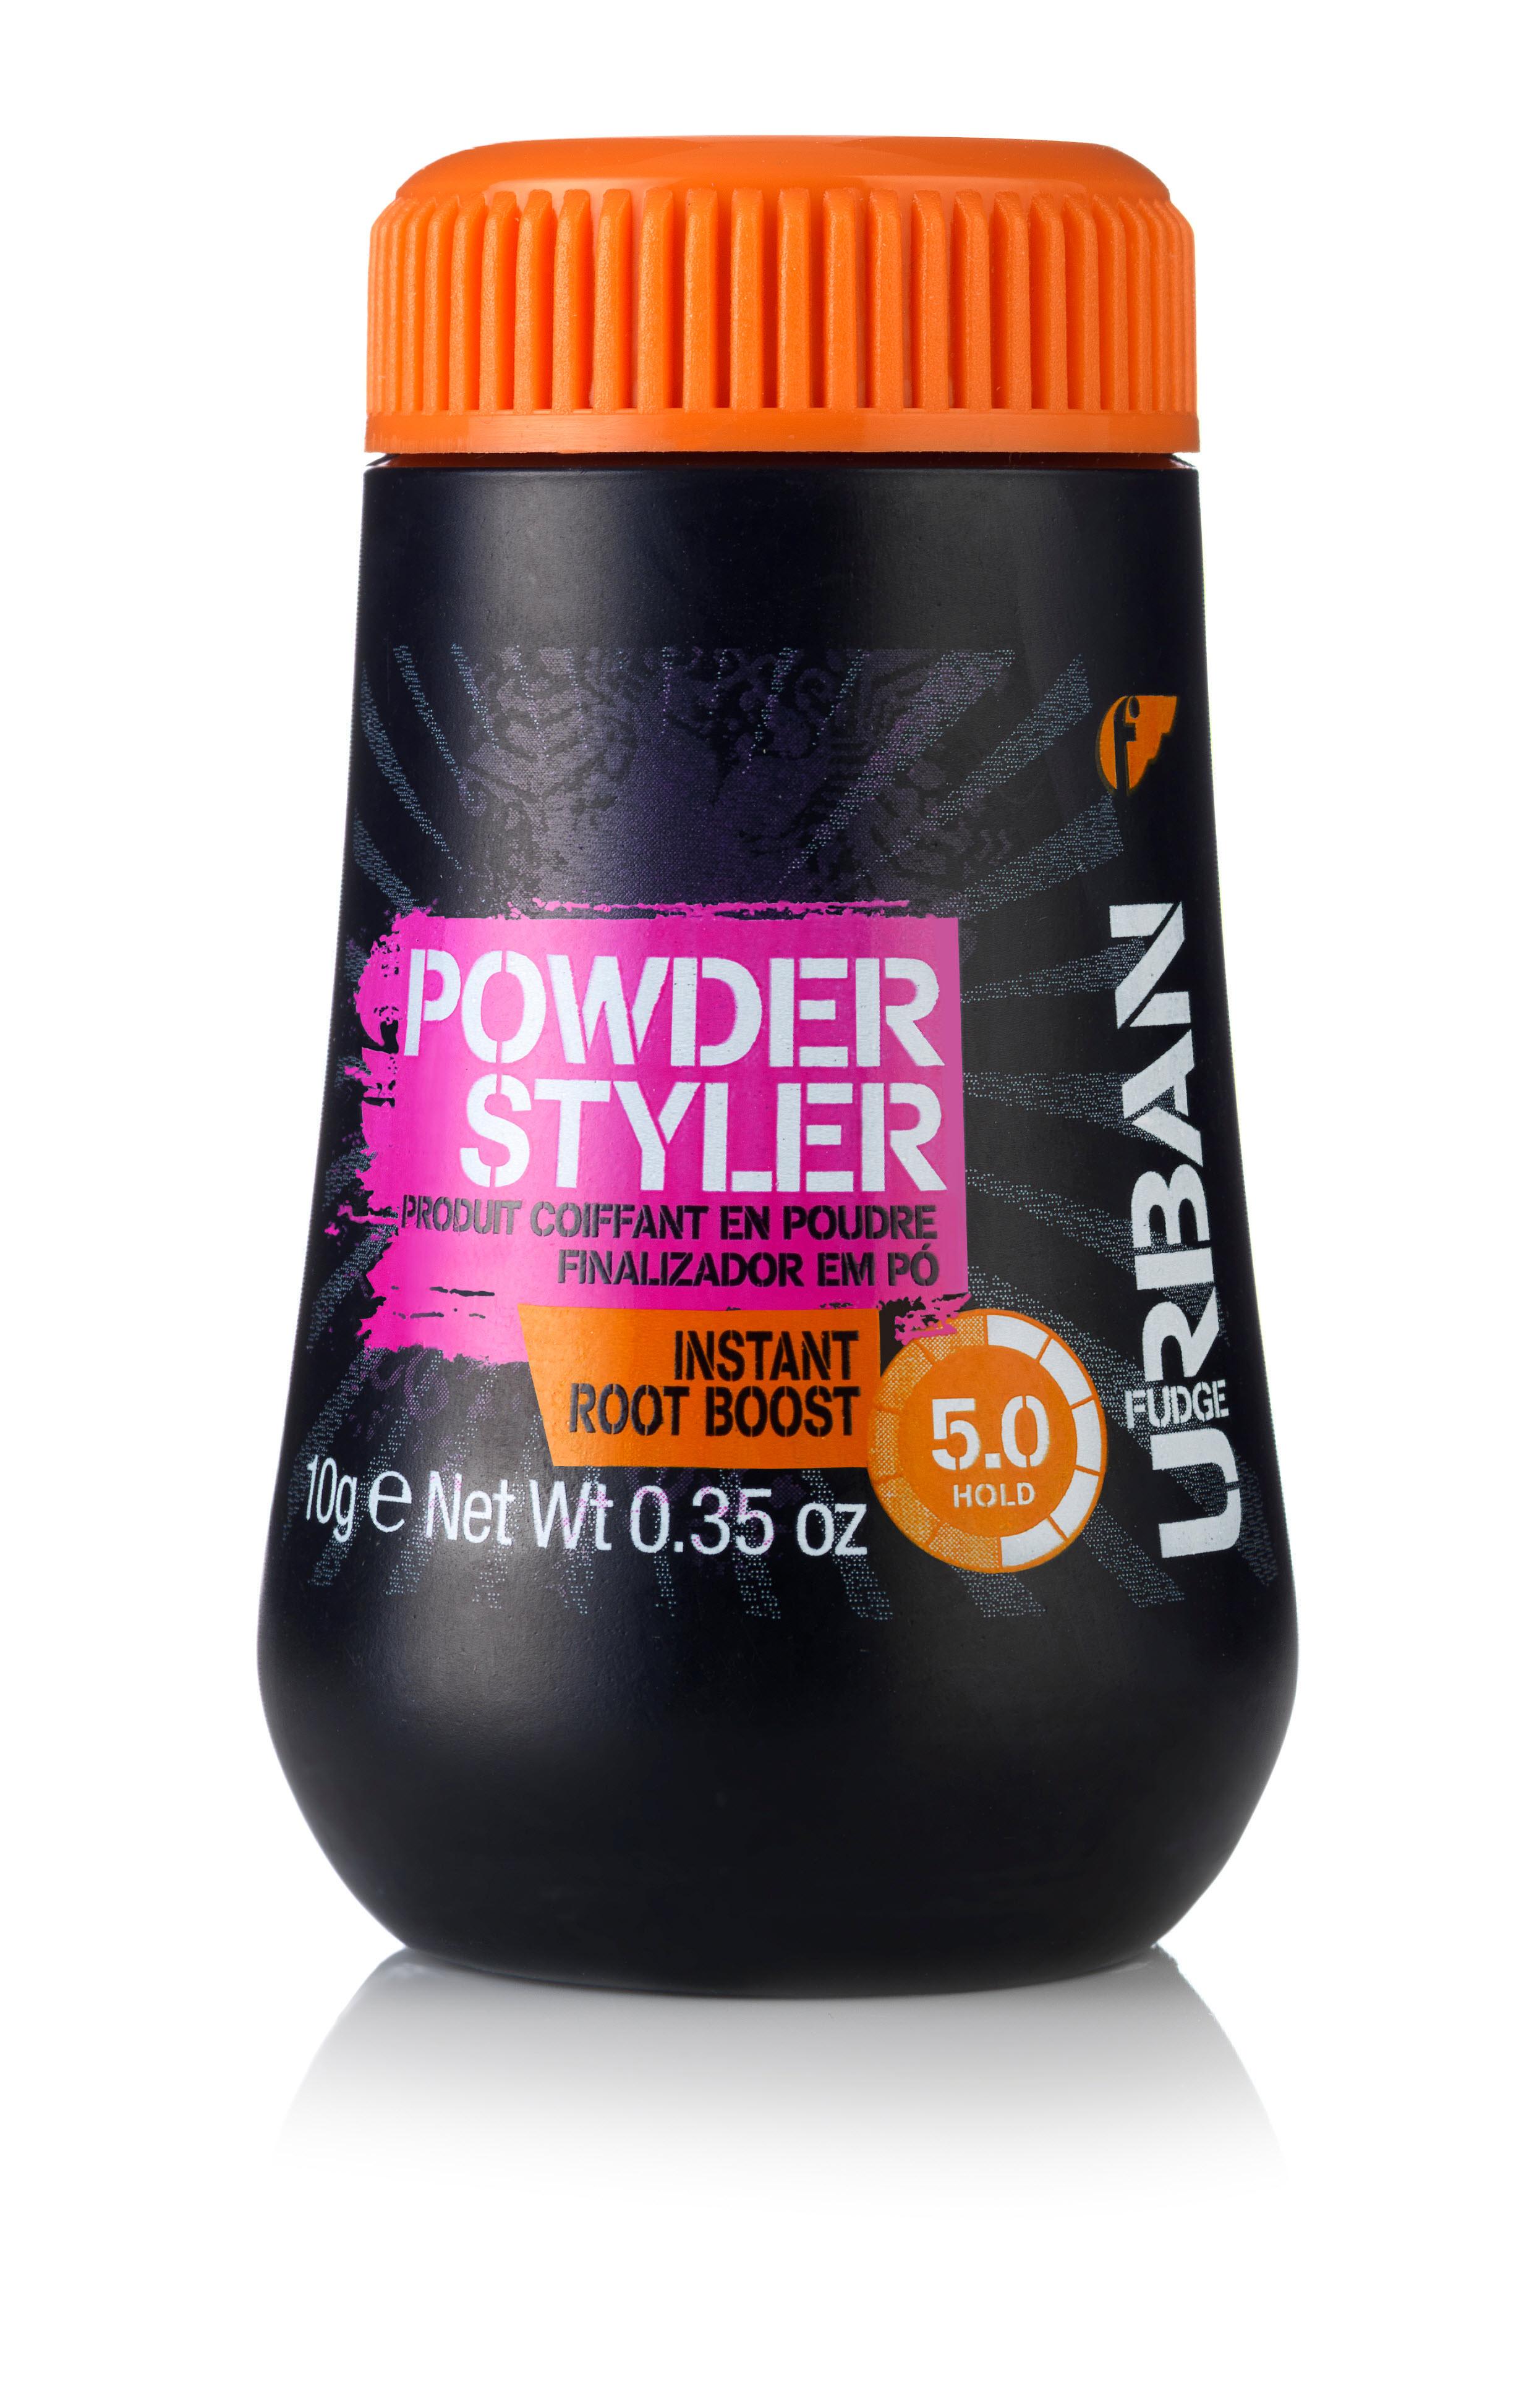 fudge urban powder styler